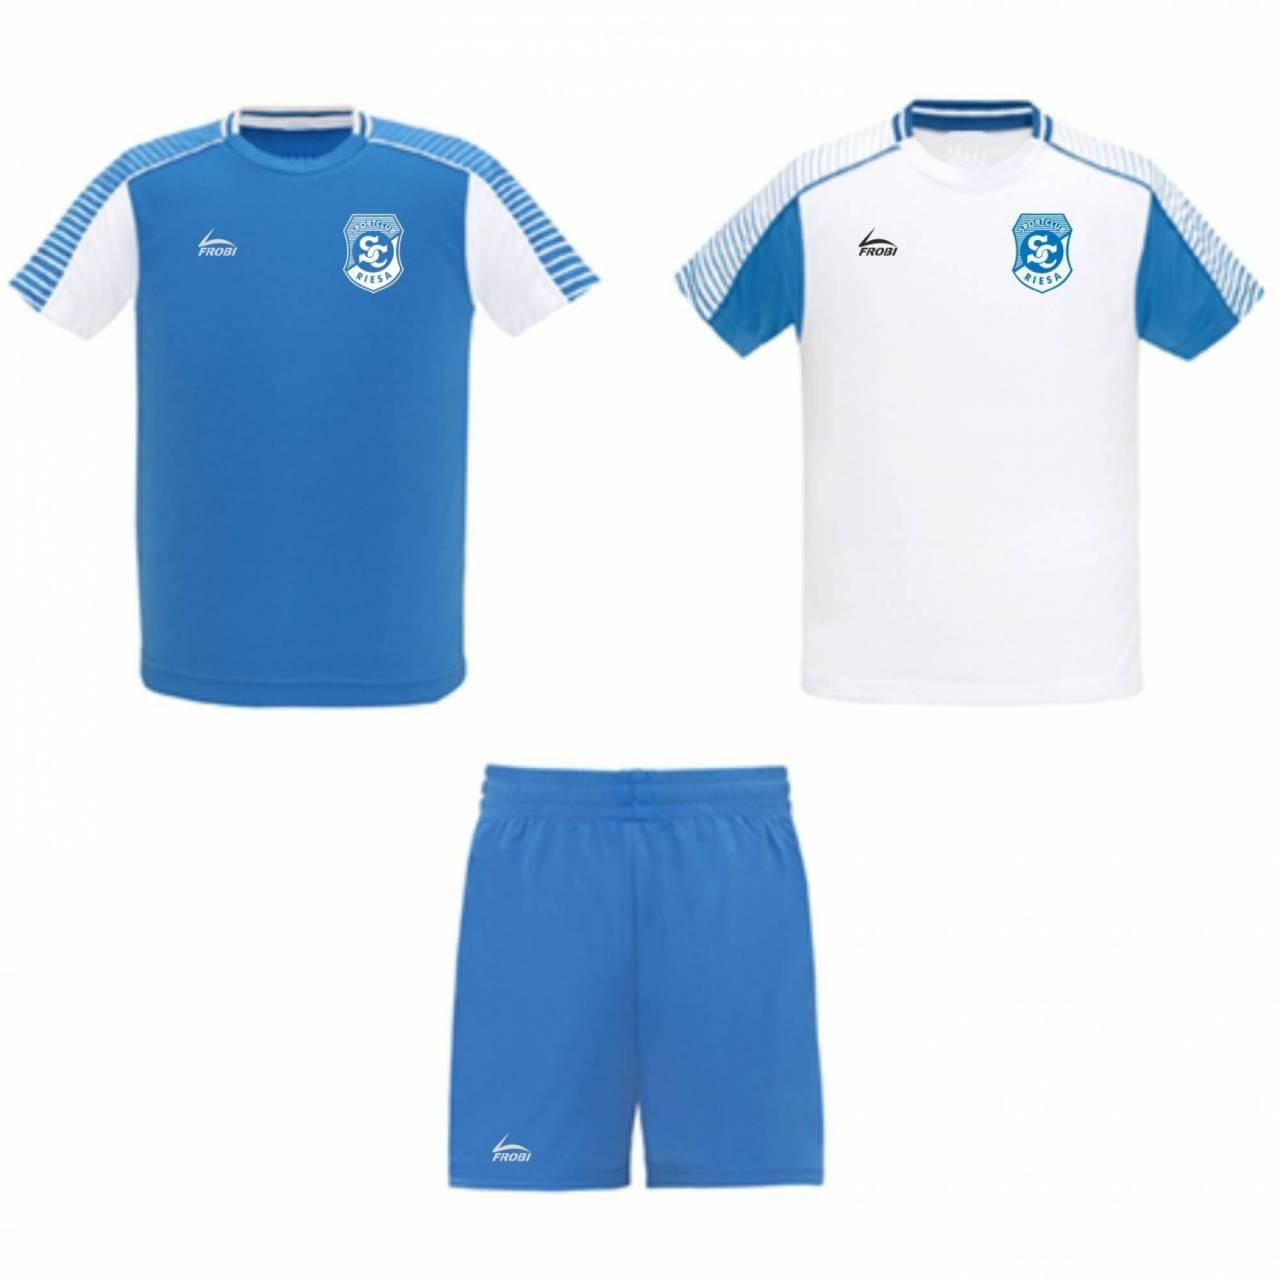 Sportset - SC Riesa